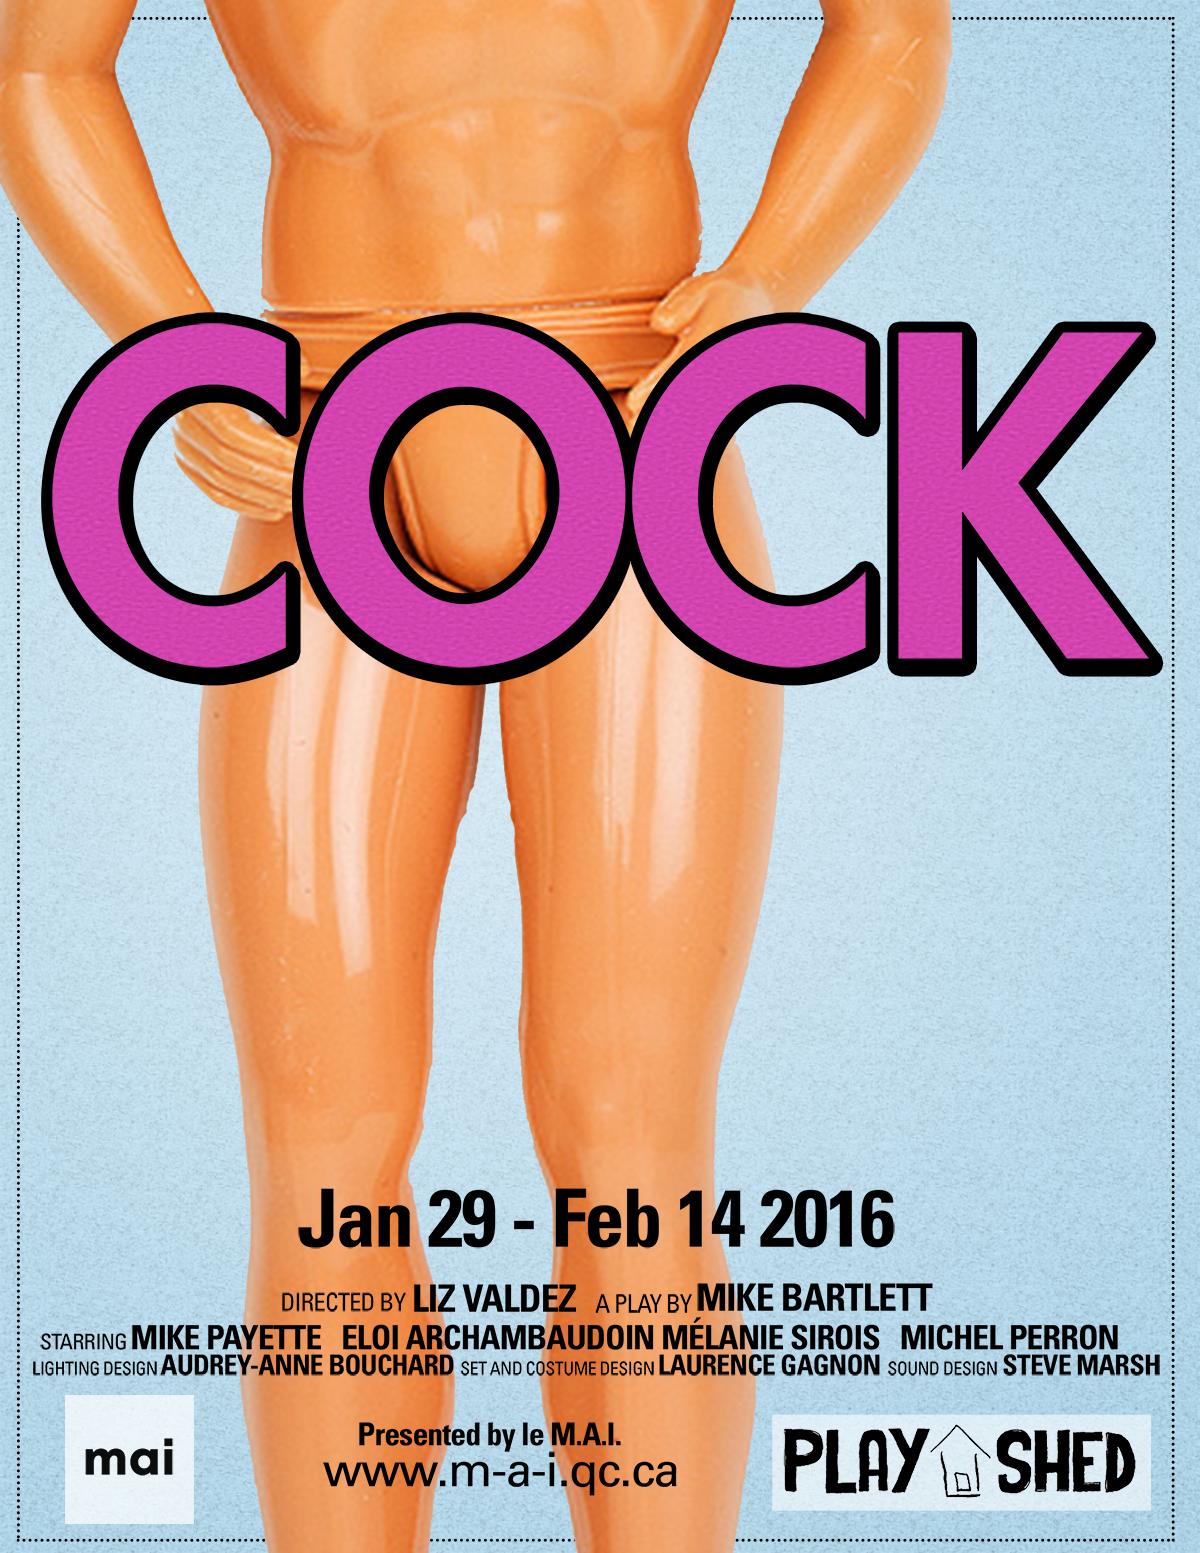 cock poster smaller.jpg